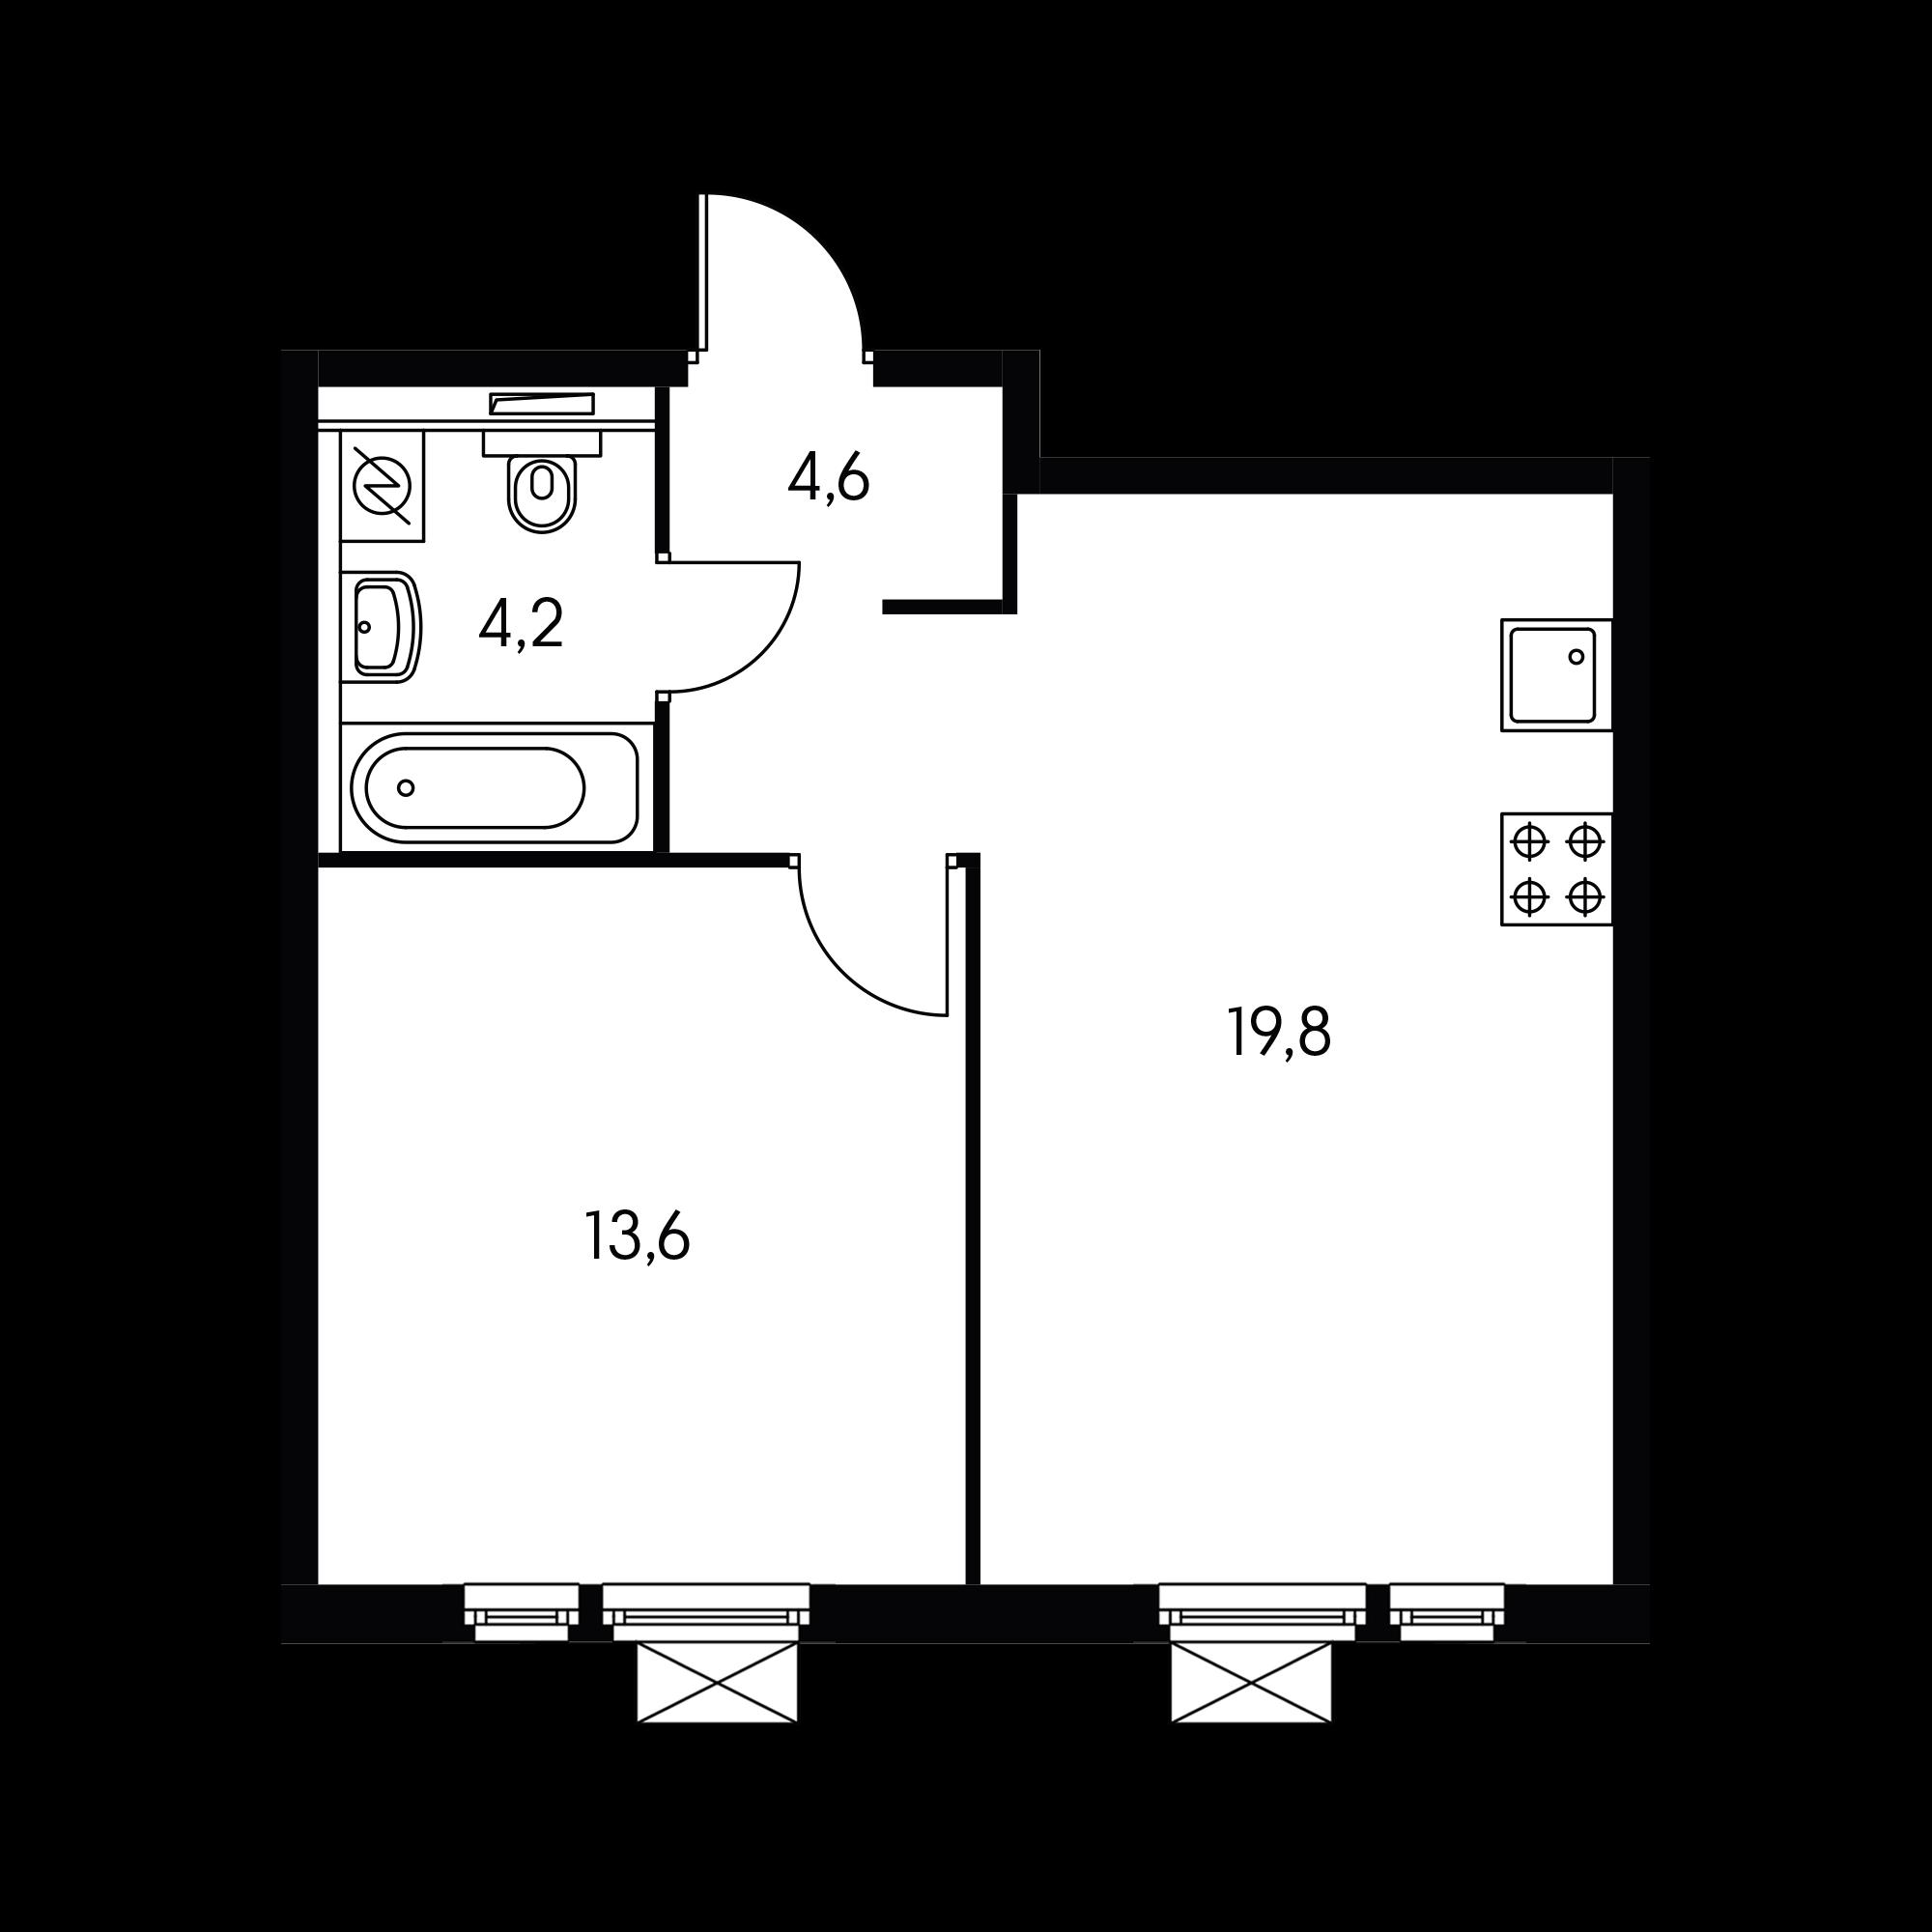 1EL3_7.2-2